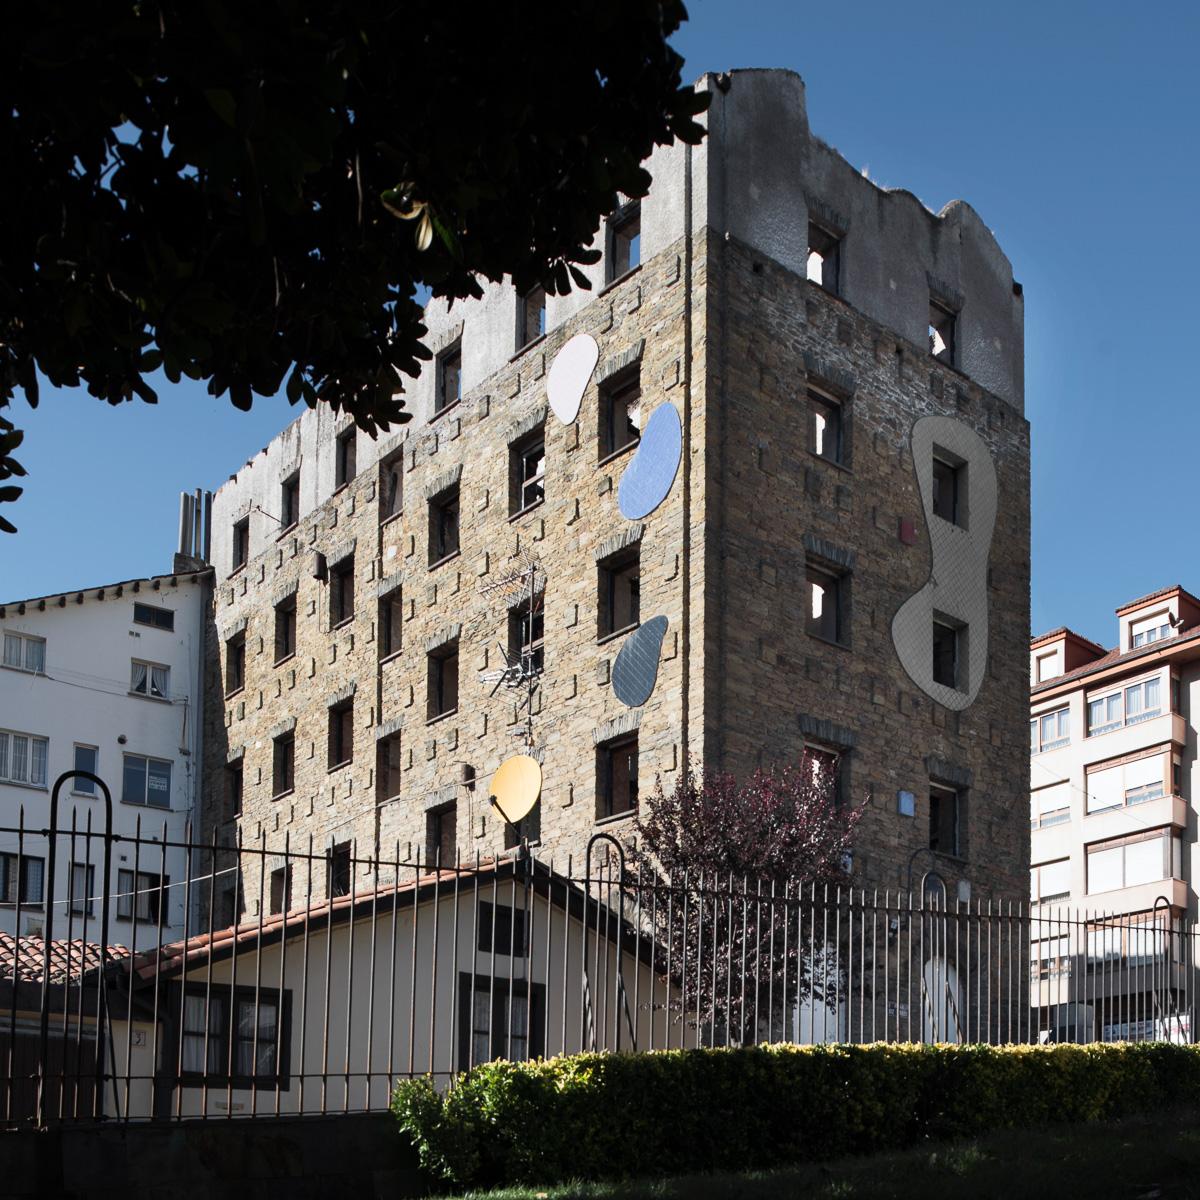 Hotel Truita en Cangas del Narcea